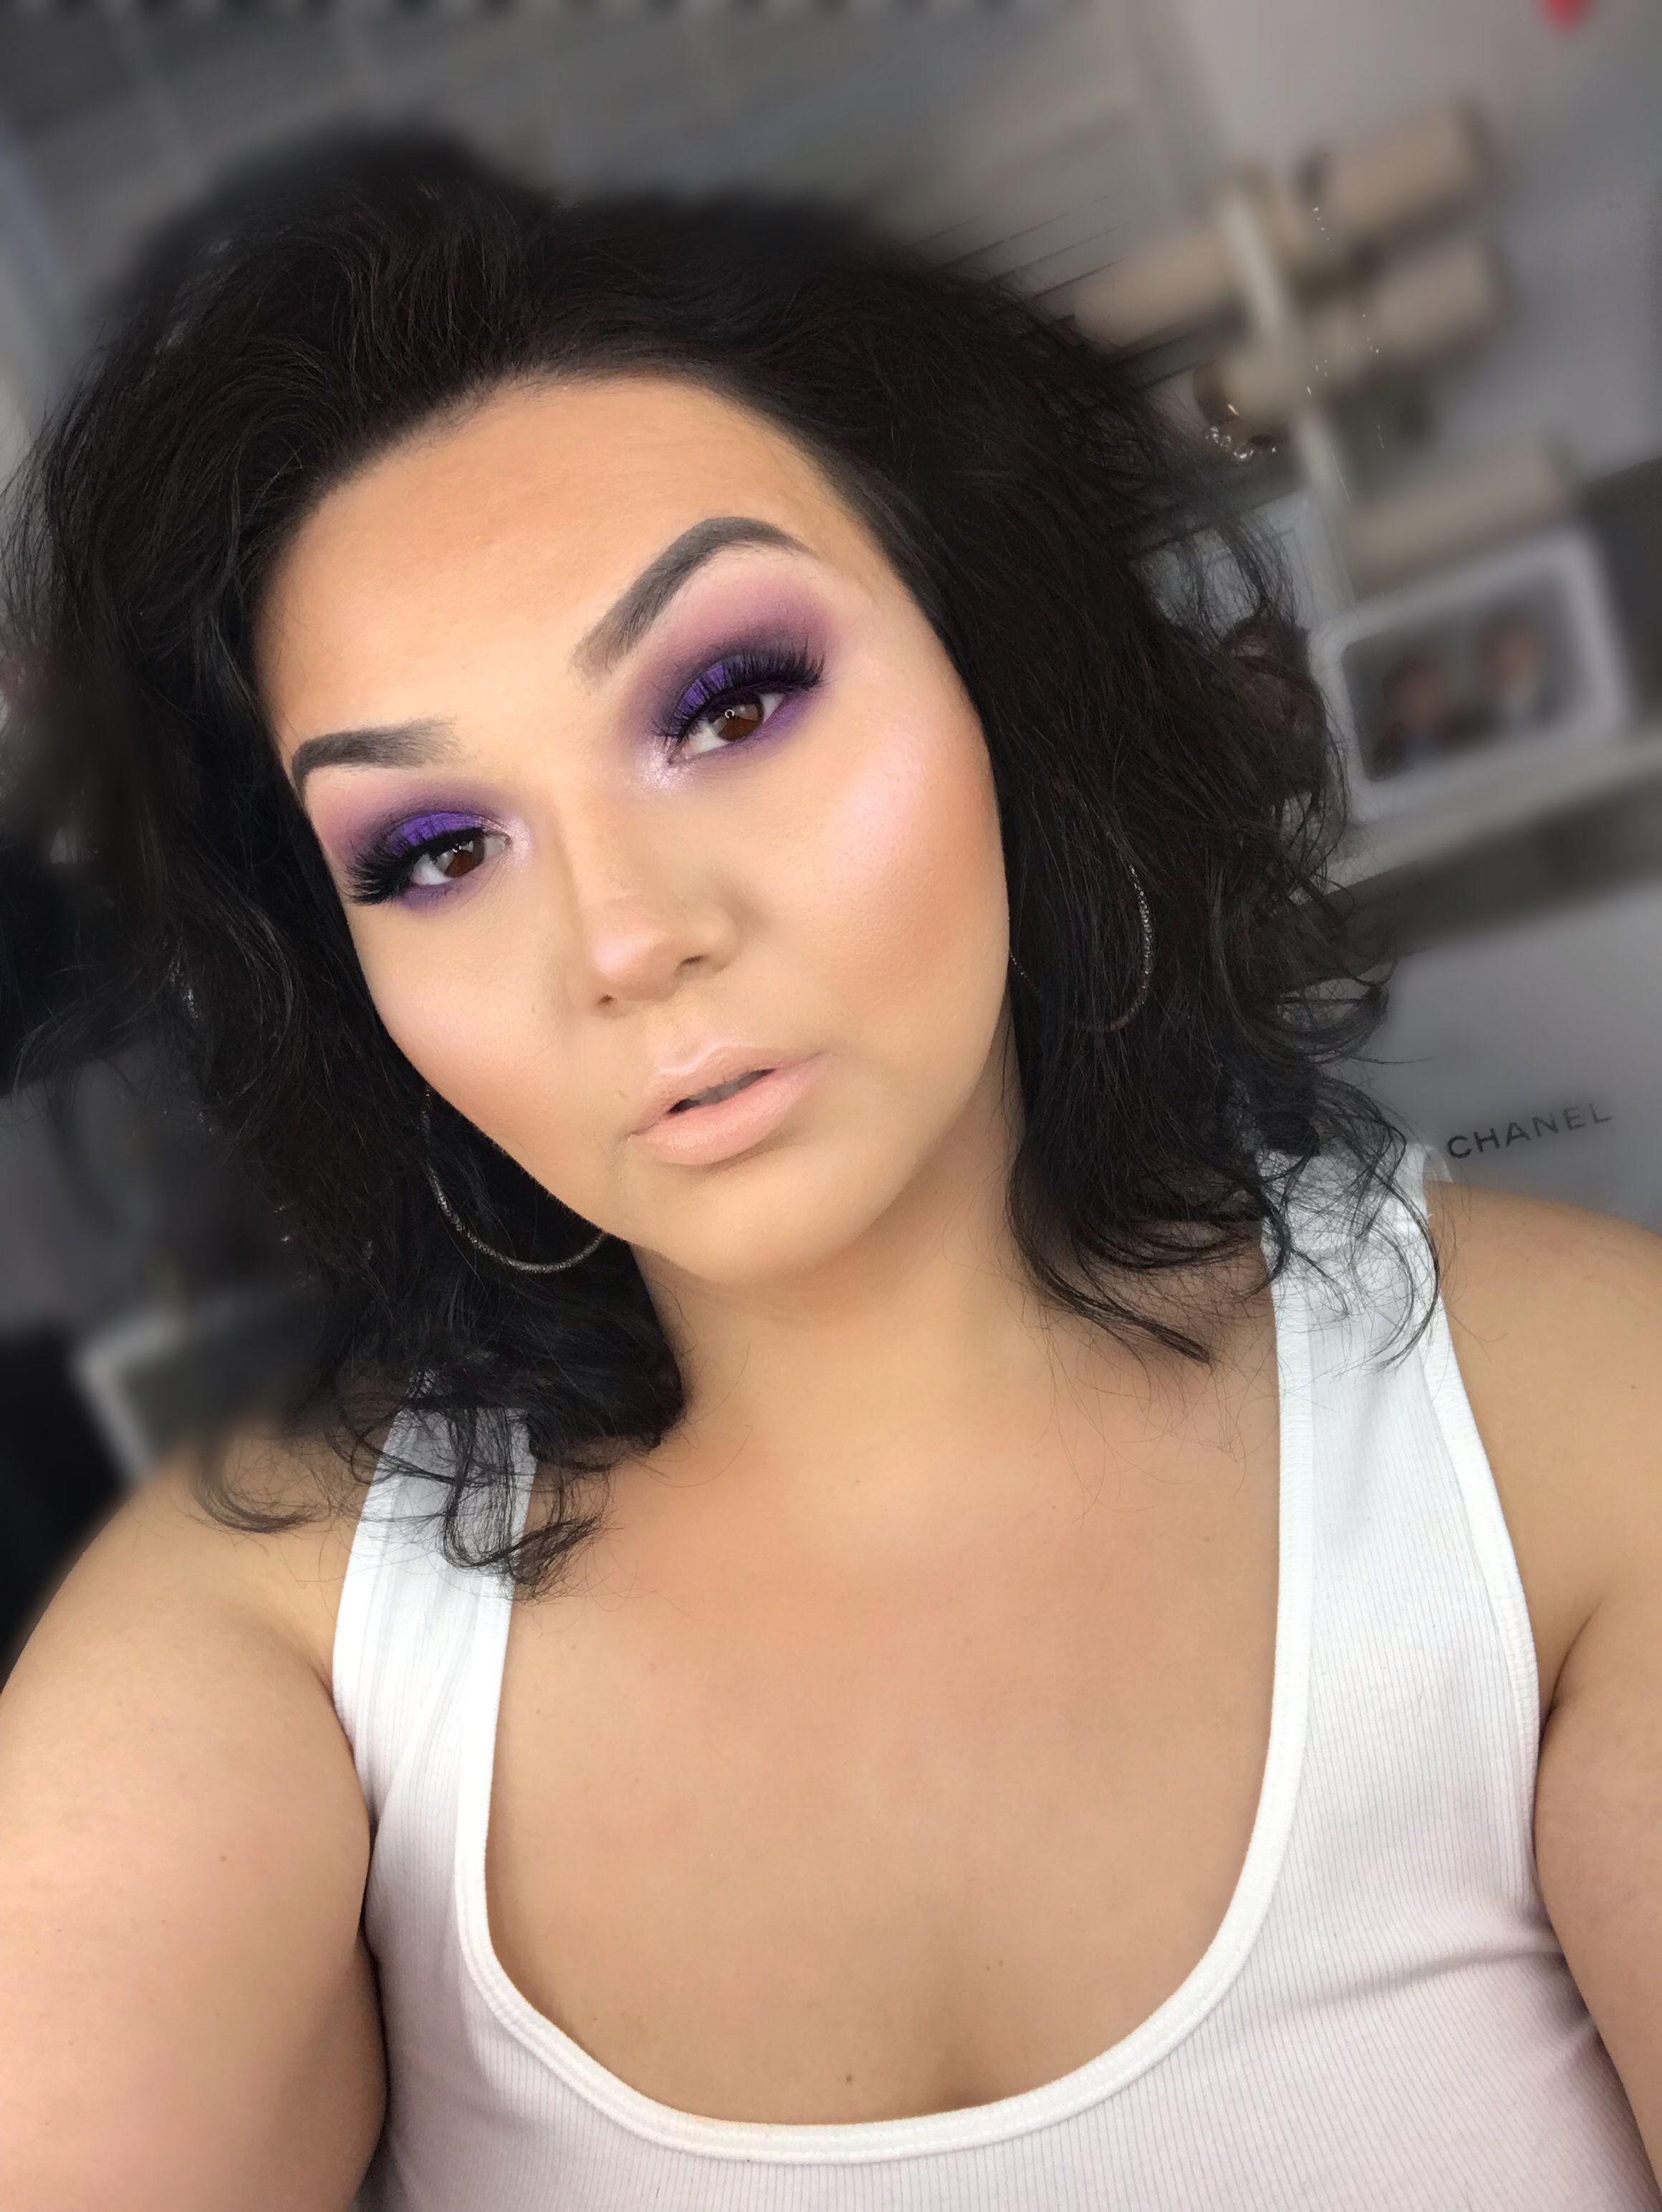 Morphe Day makeup looks